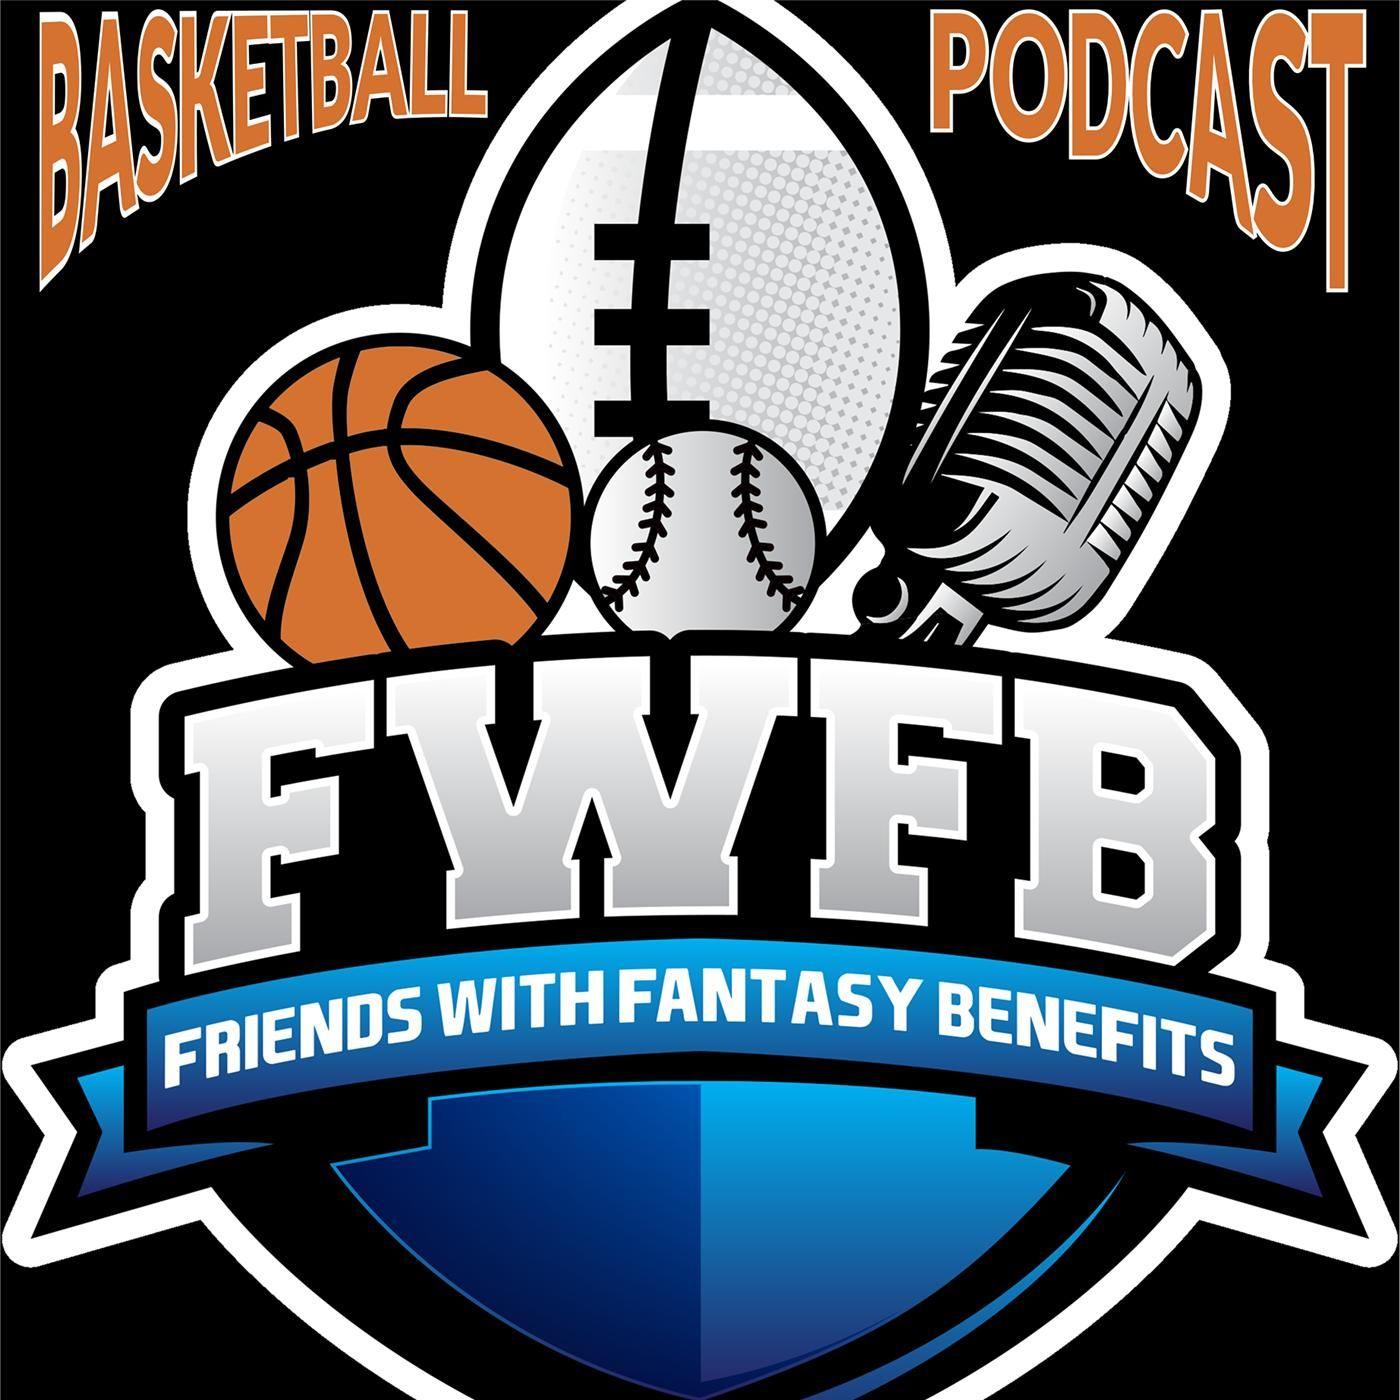 FWFB | Basketball - Episode 73